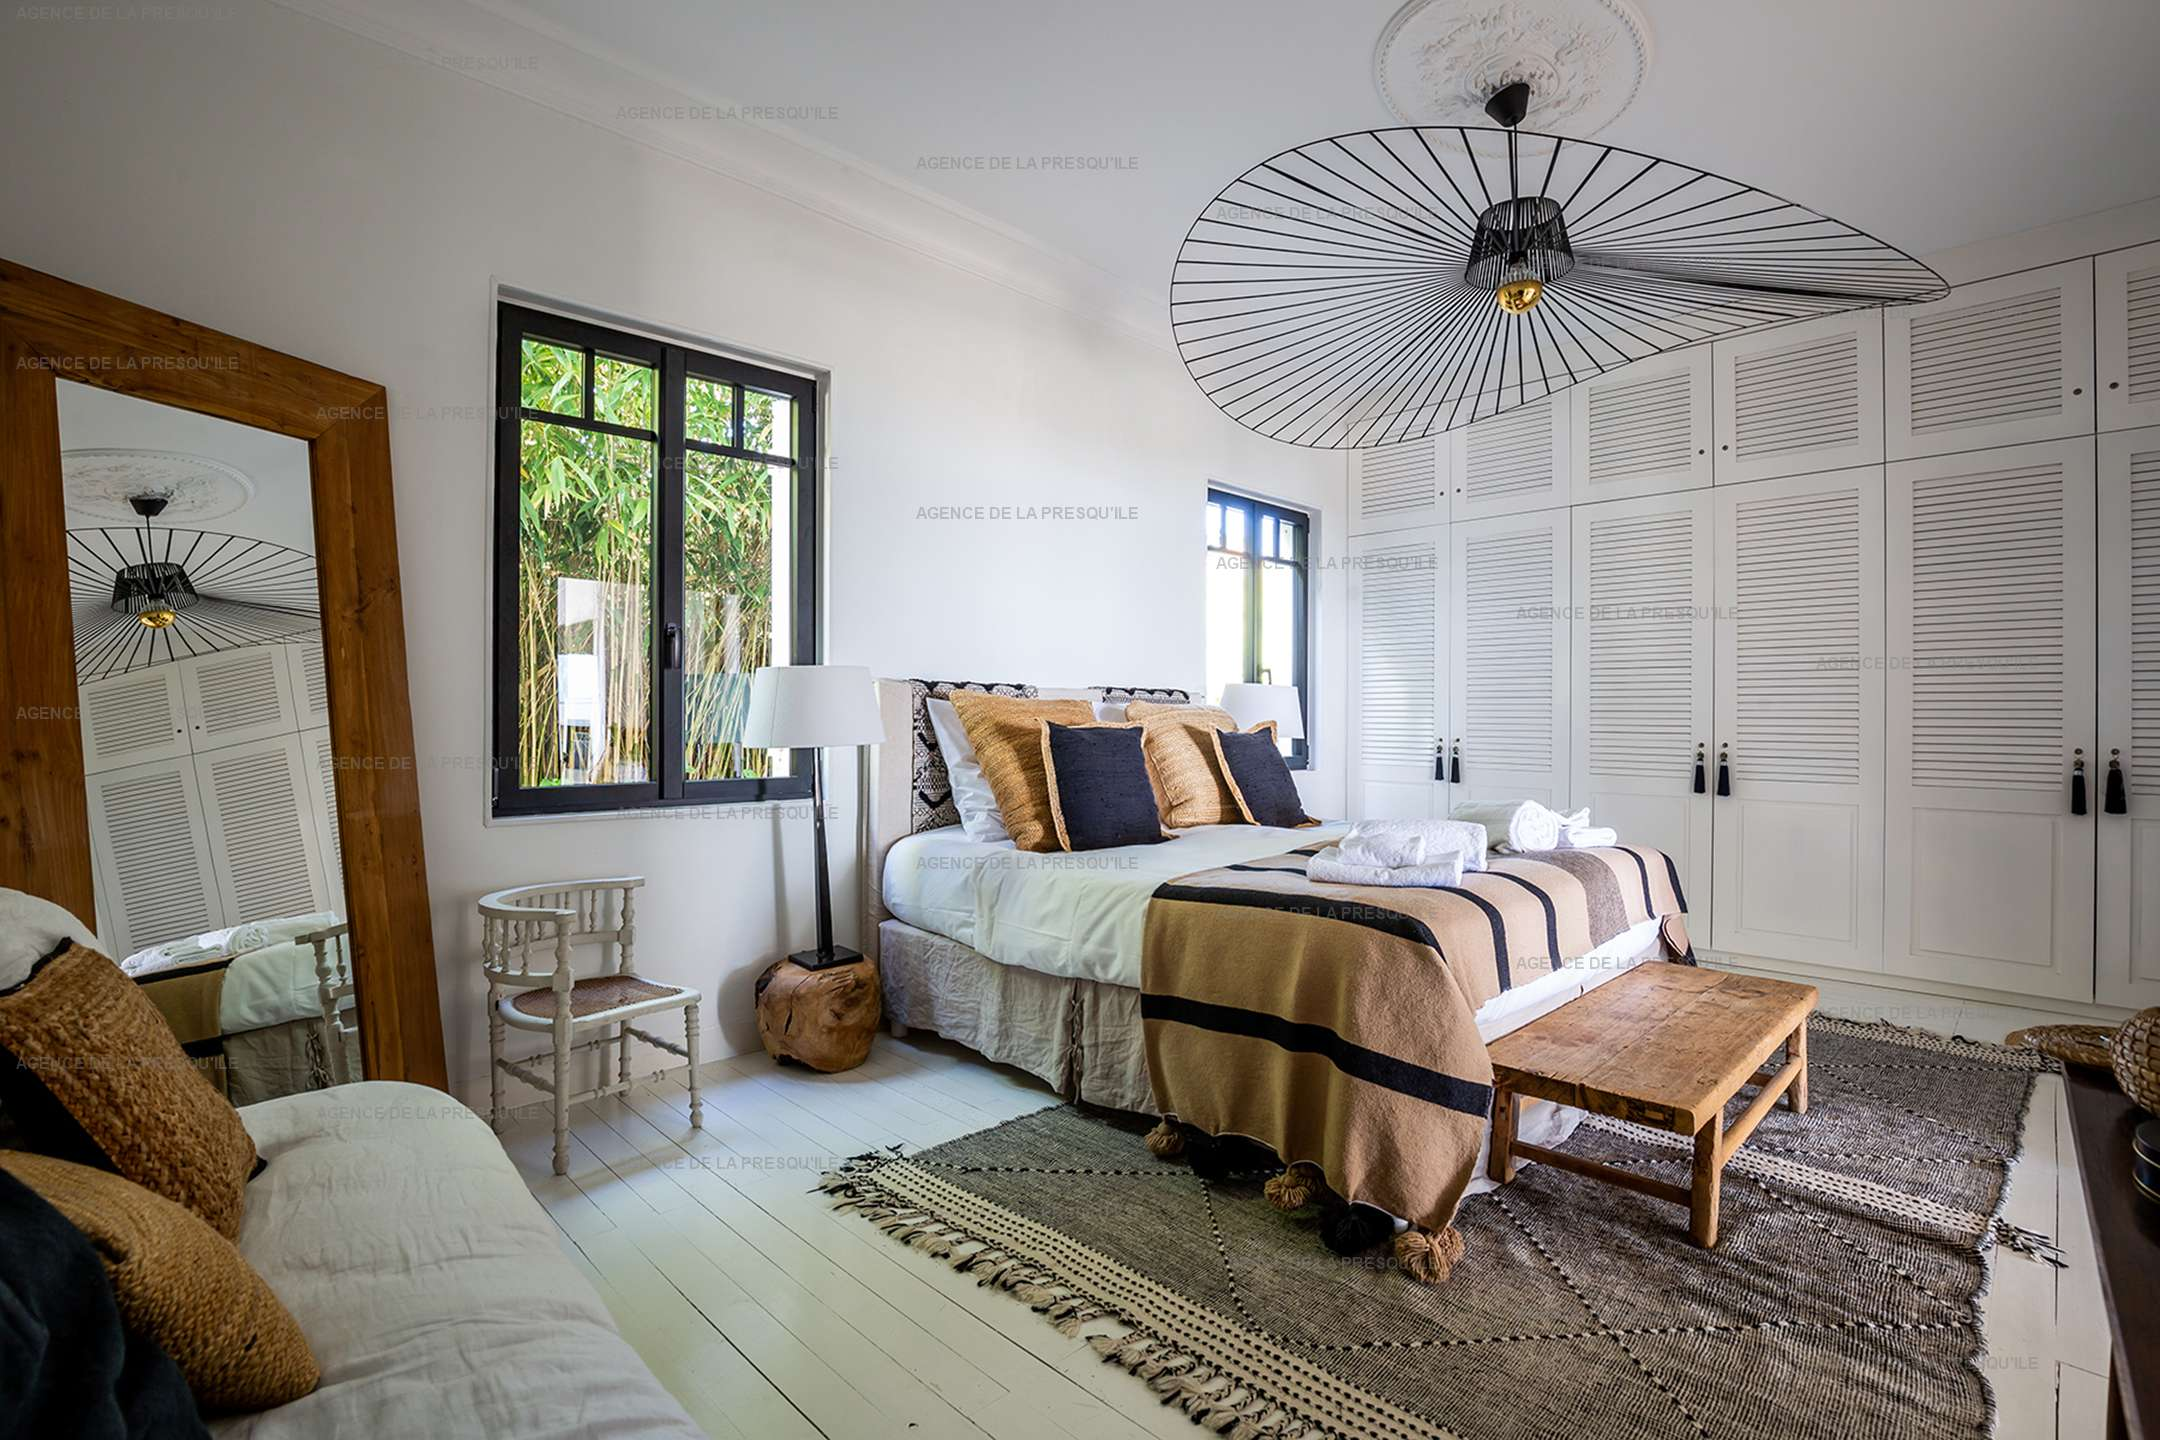 Location: Superbe villa avec vue bassin et piscine 9